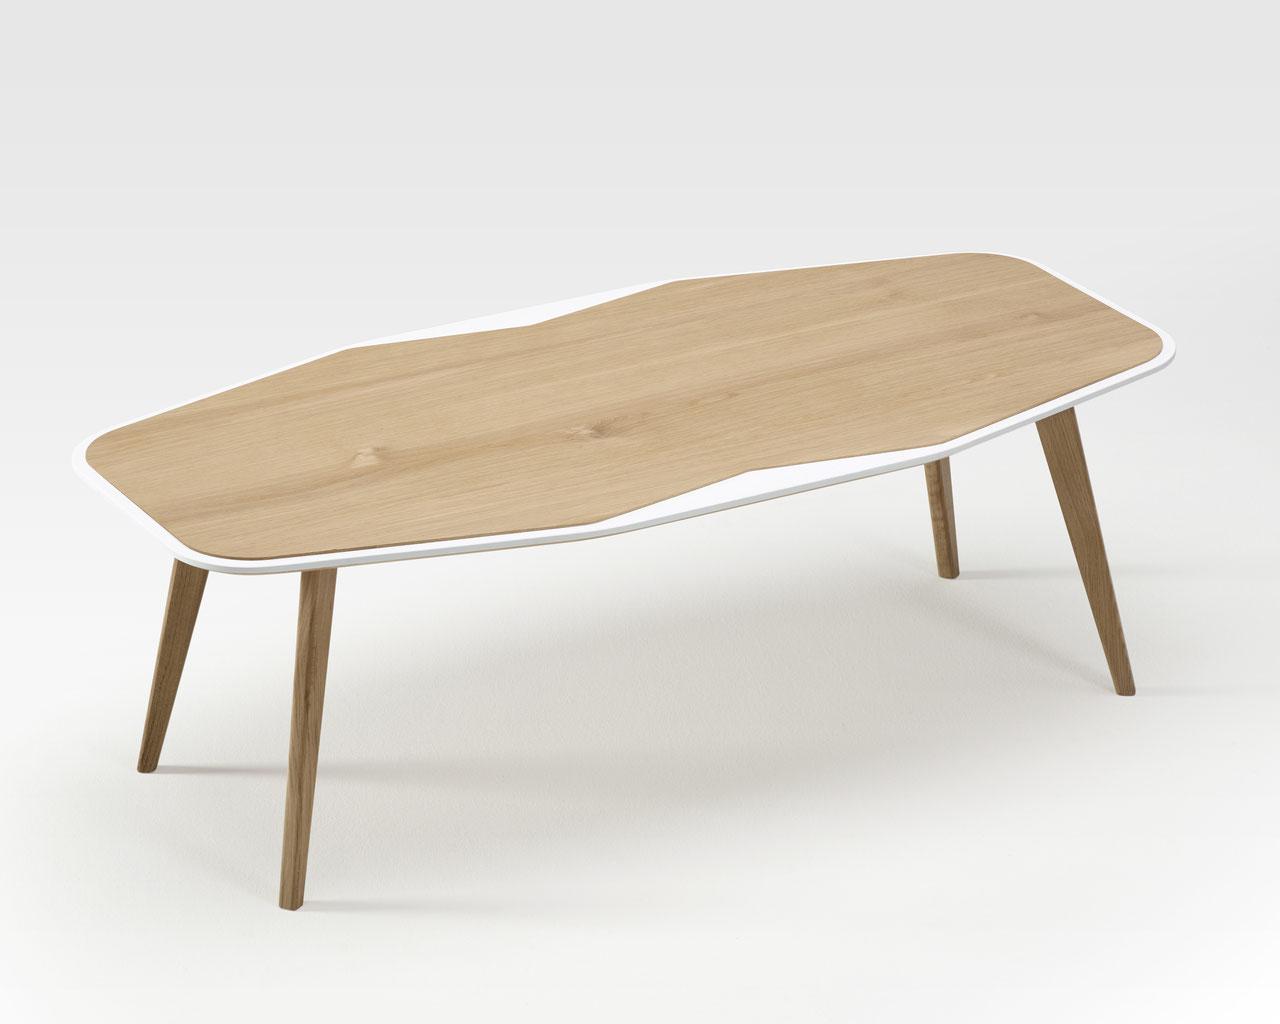 Table Basse F 73 Collection Flo Julie Gaillard Design